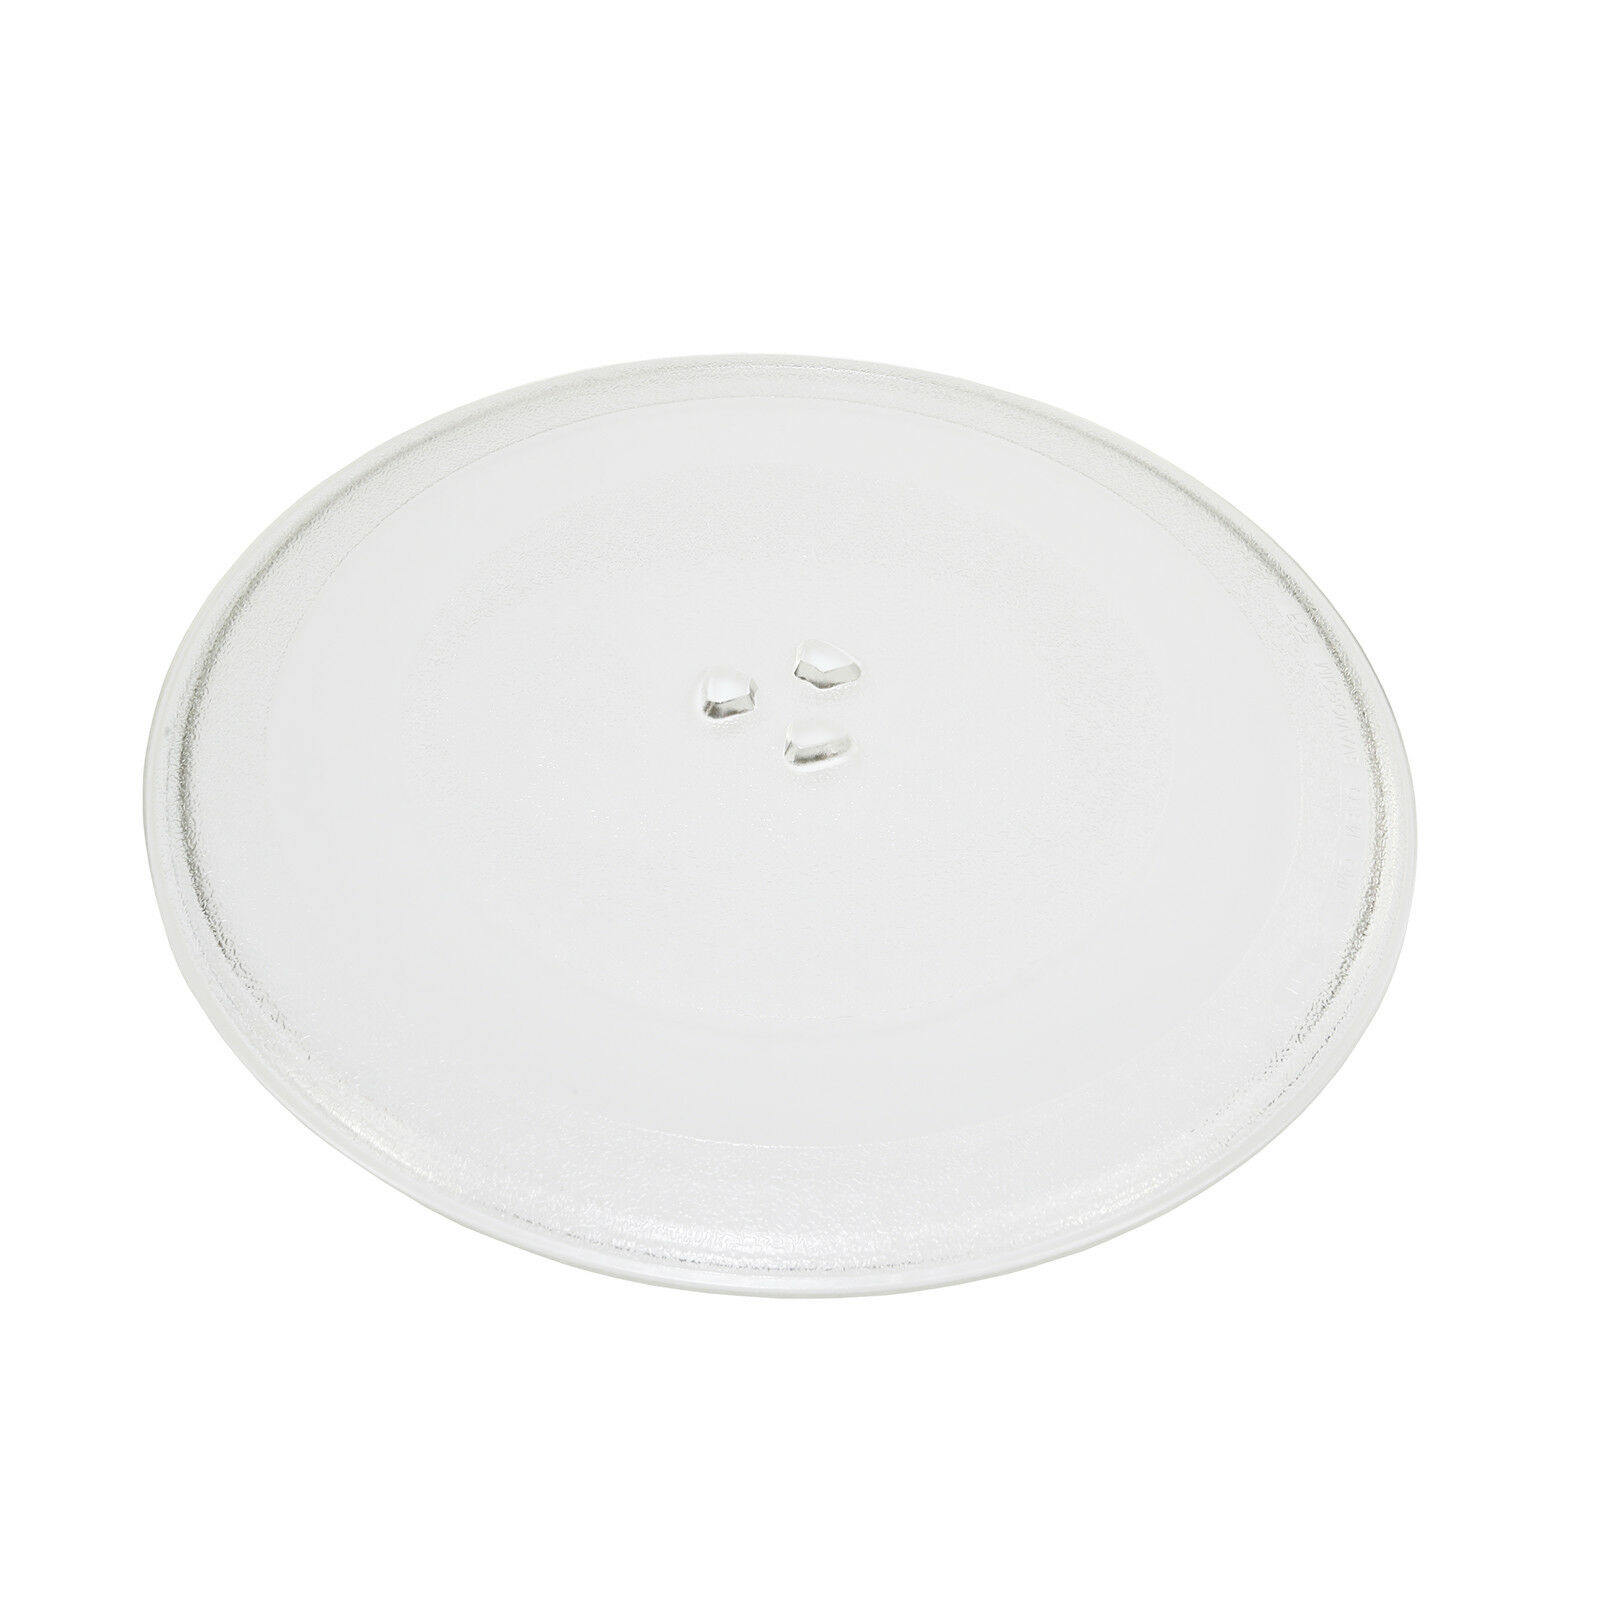 Panasonic NNV453W Microwave Genuine Glass Plate Turntable